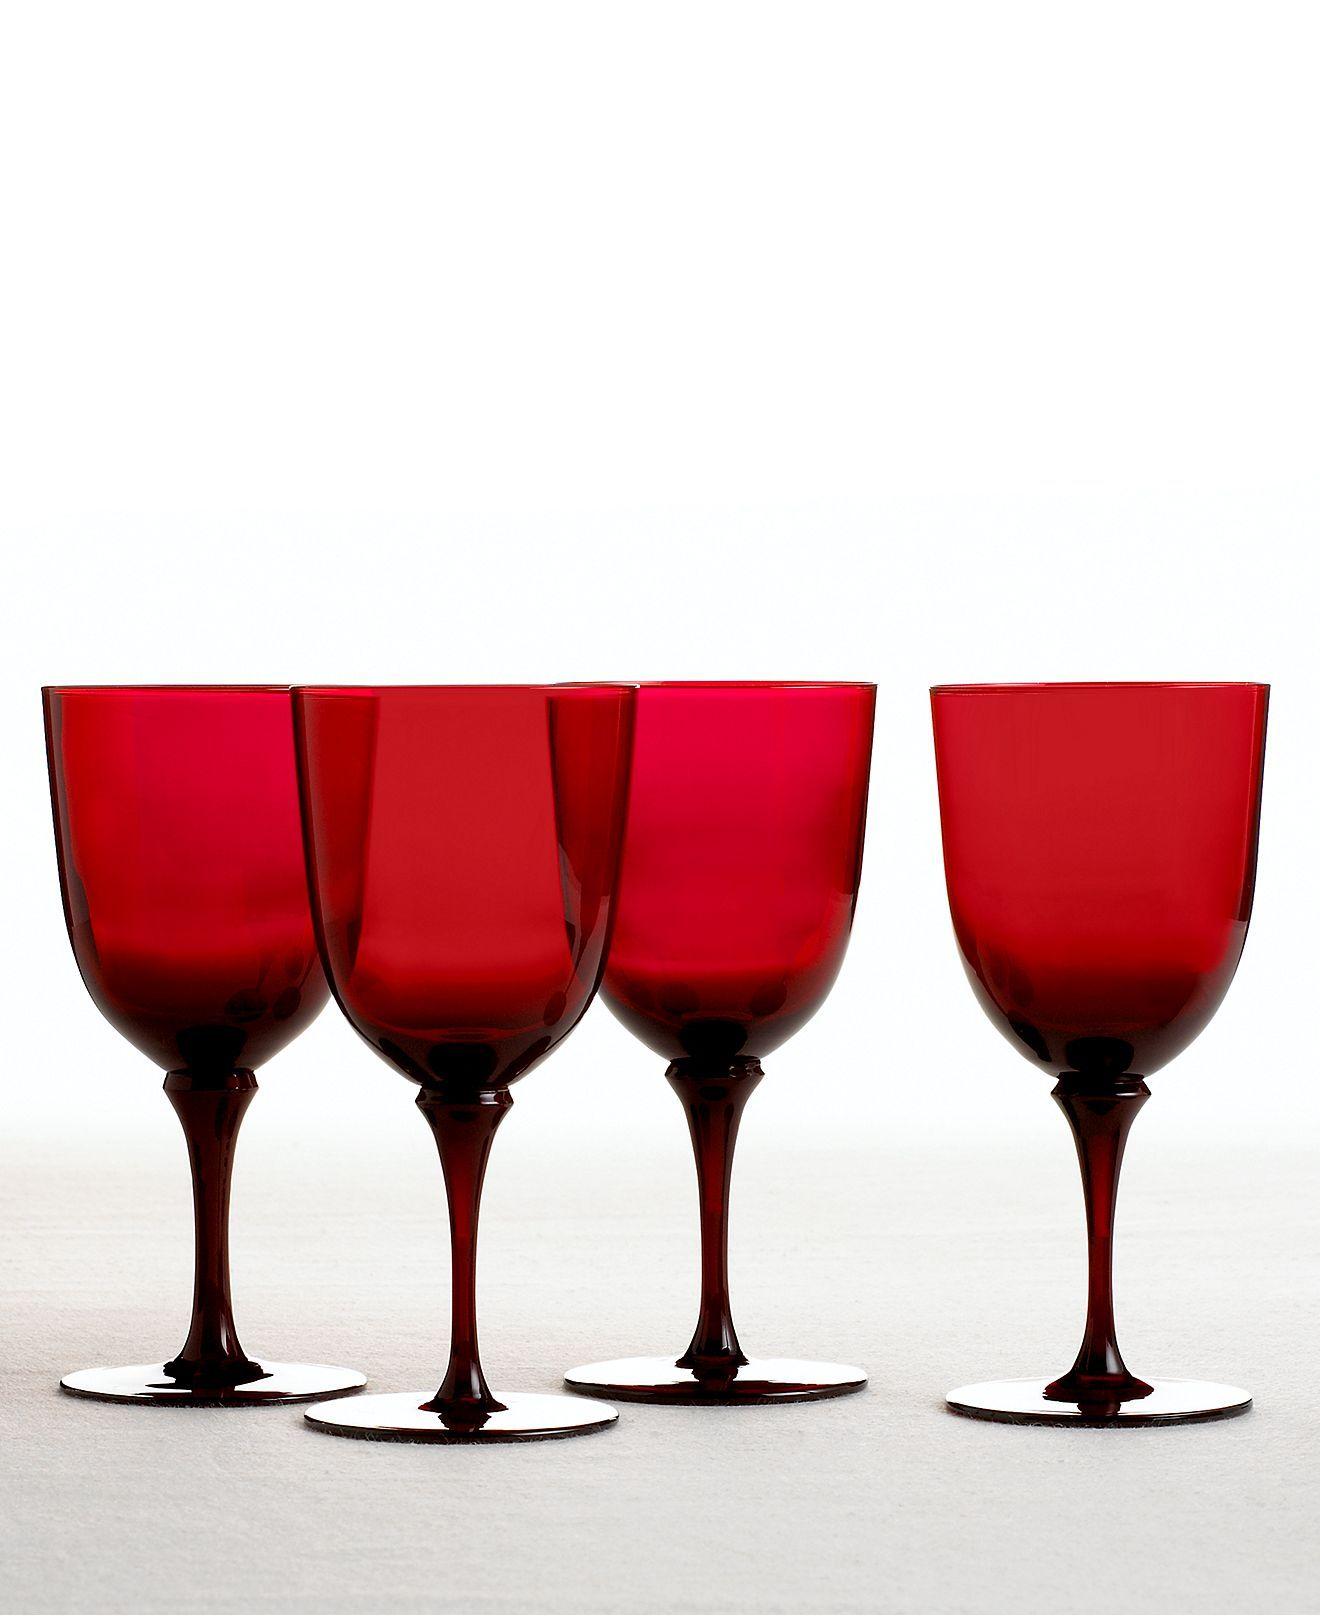 Martha Stewart Collection Wine Glasses Set Of 4 Red Goblets Martha Stewart Collection Dining Entertaining Macys Wine Collection Red Glassware